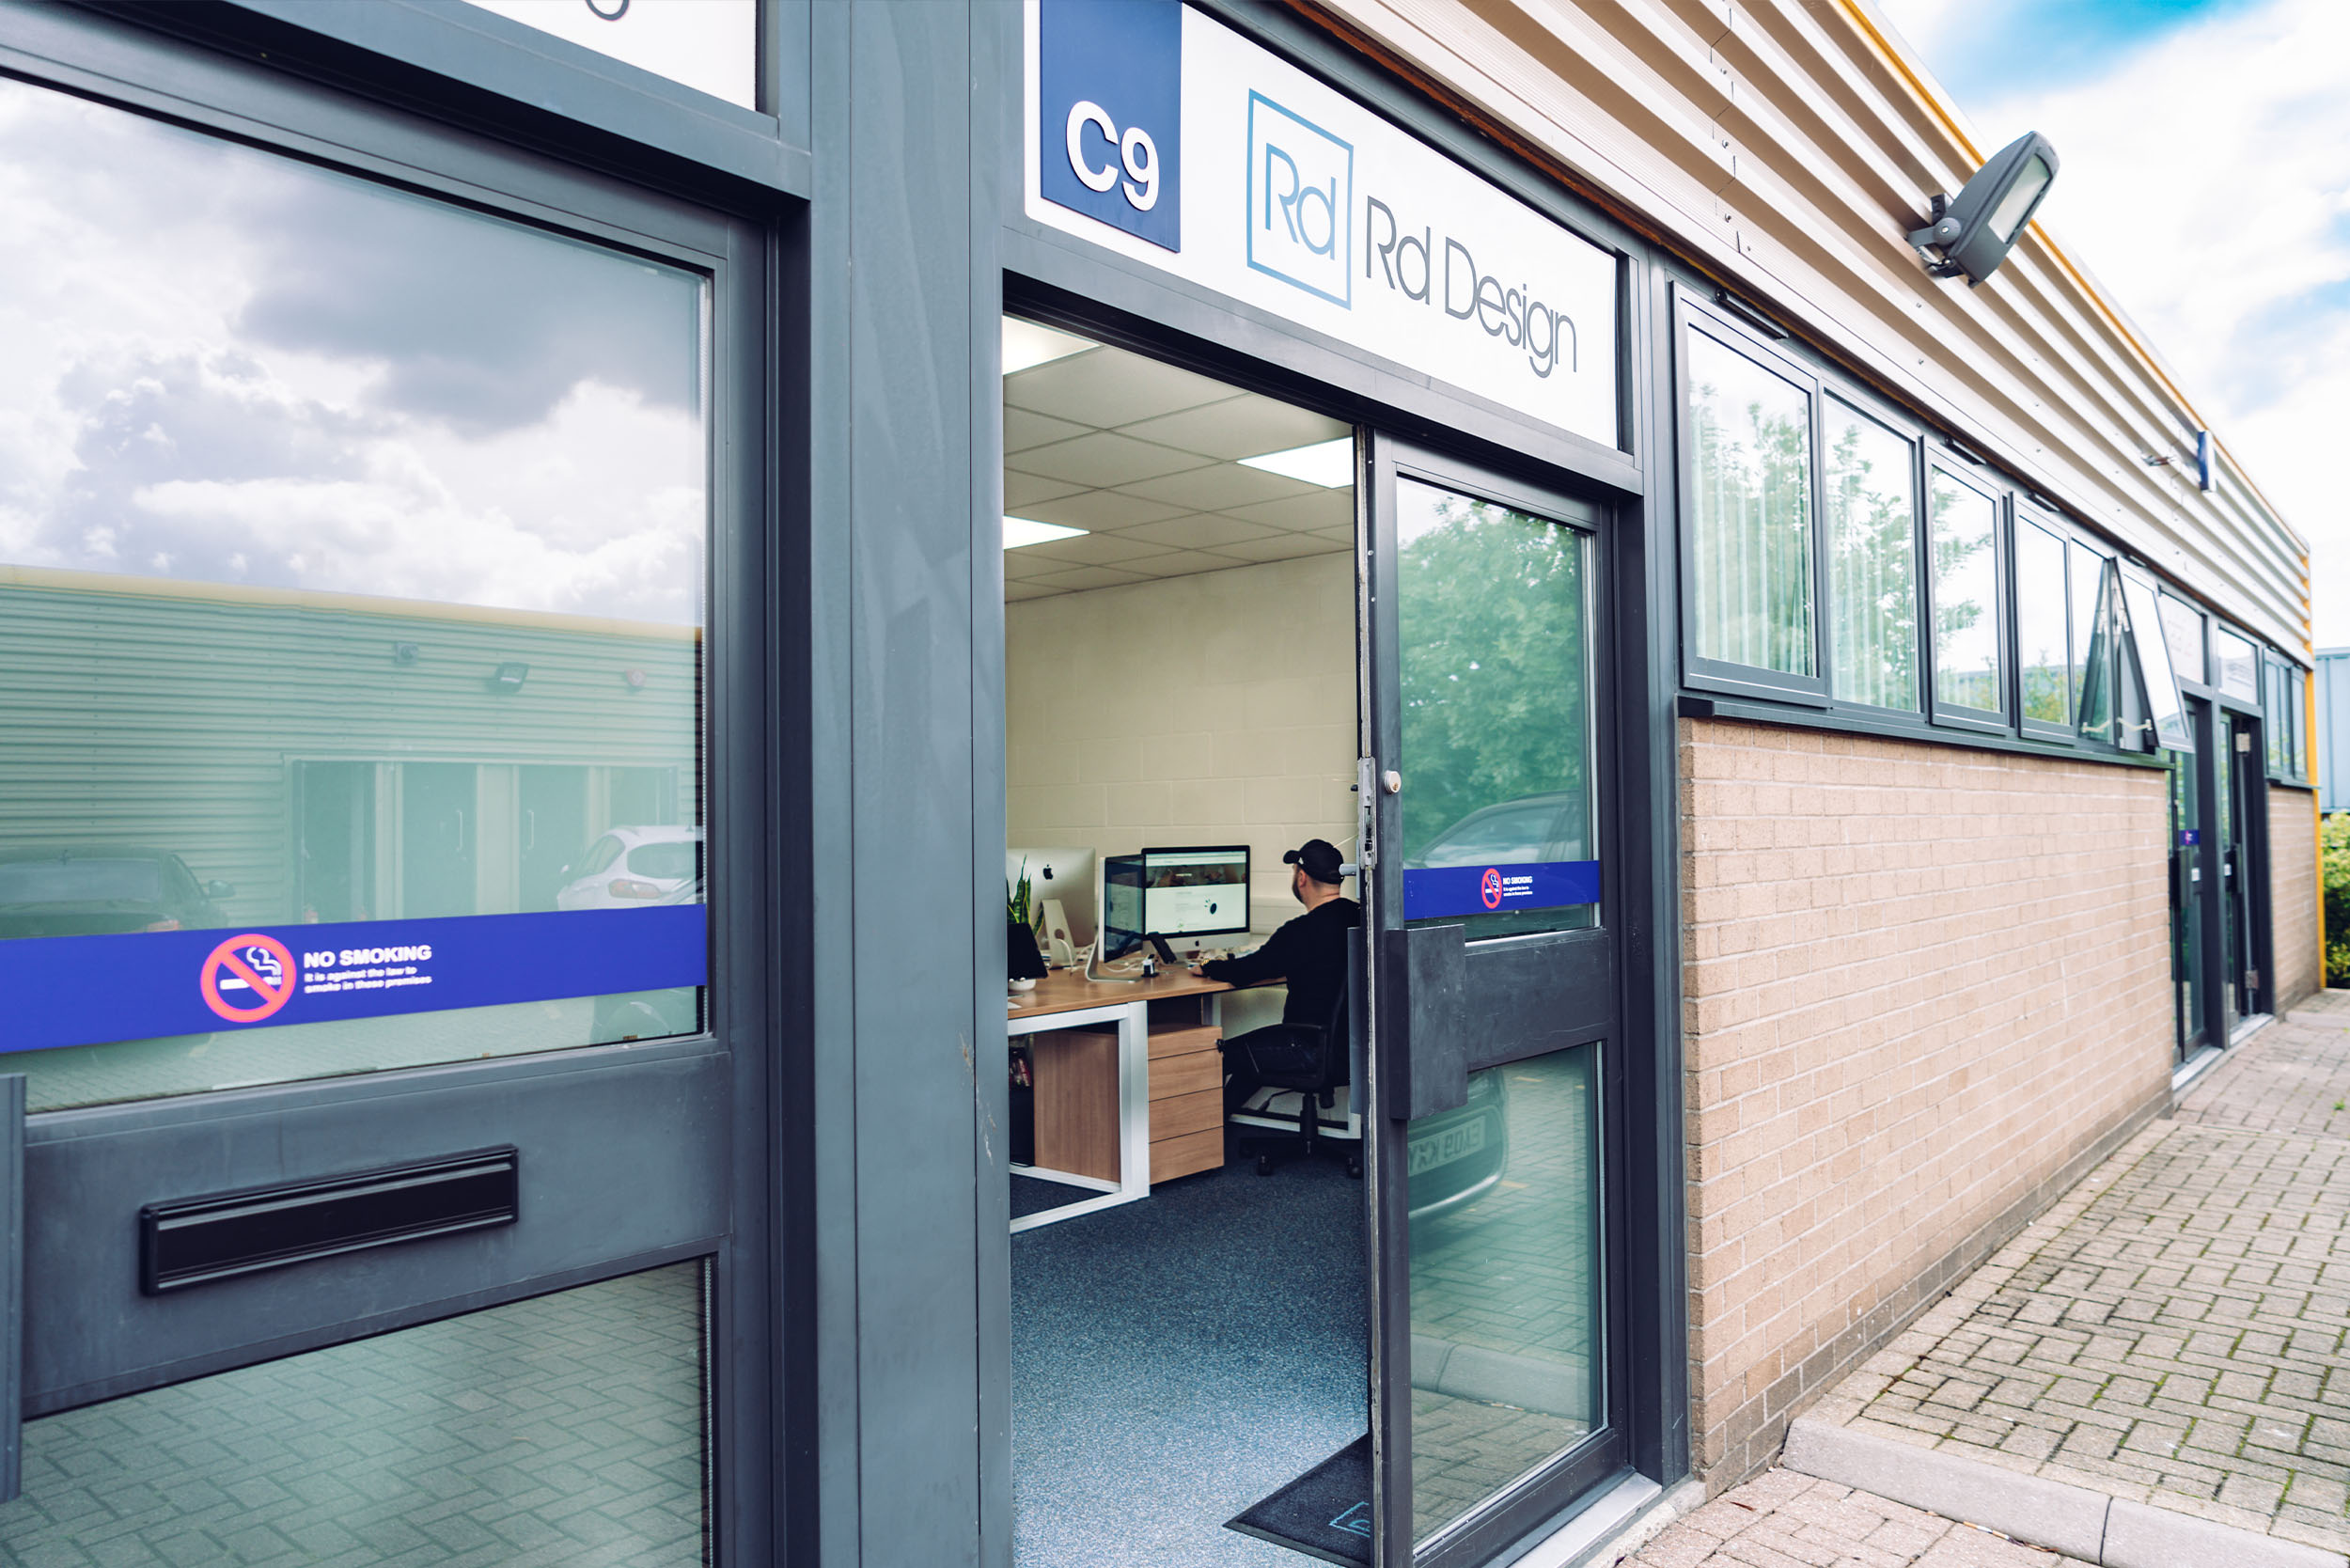 Rd Design - Marketing and Design Studio - Colchester, Essex 2.jpg